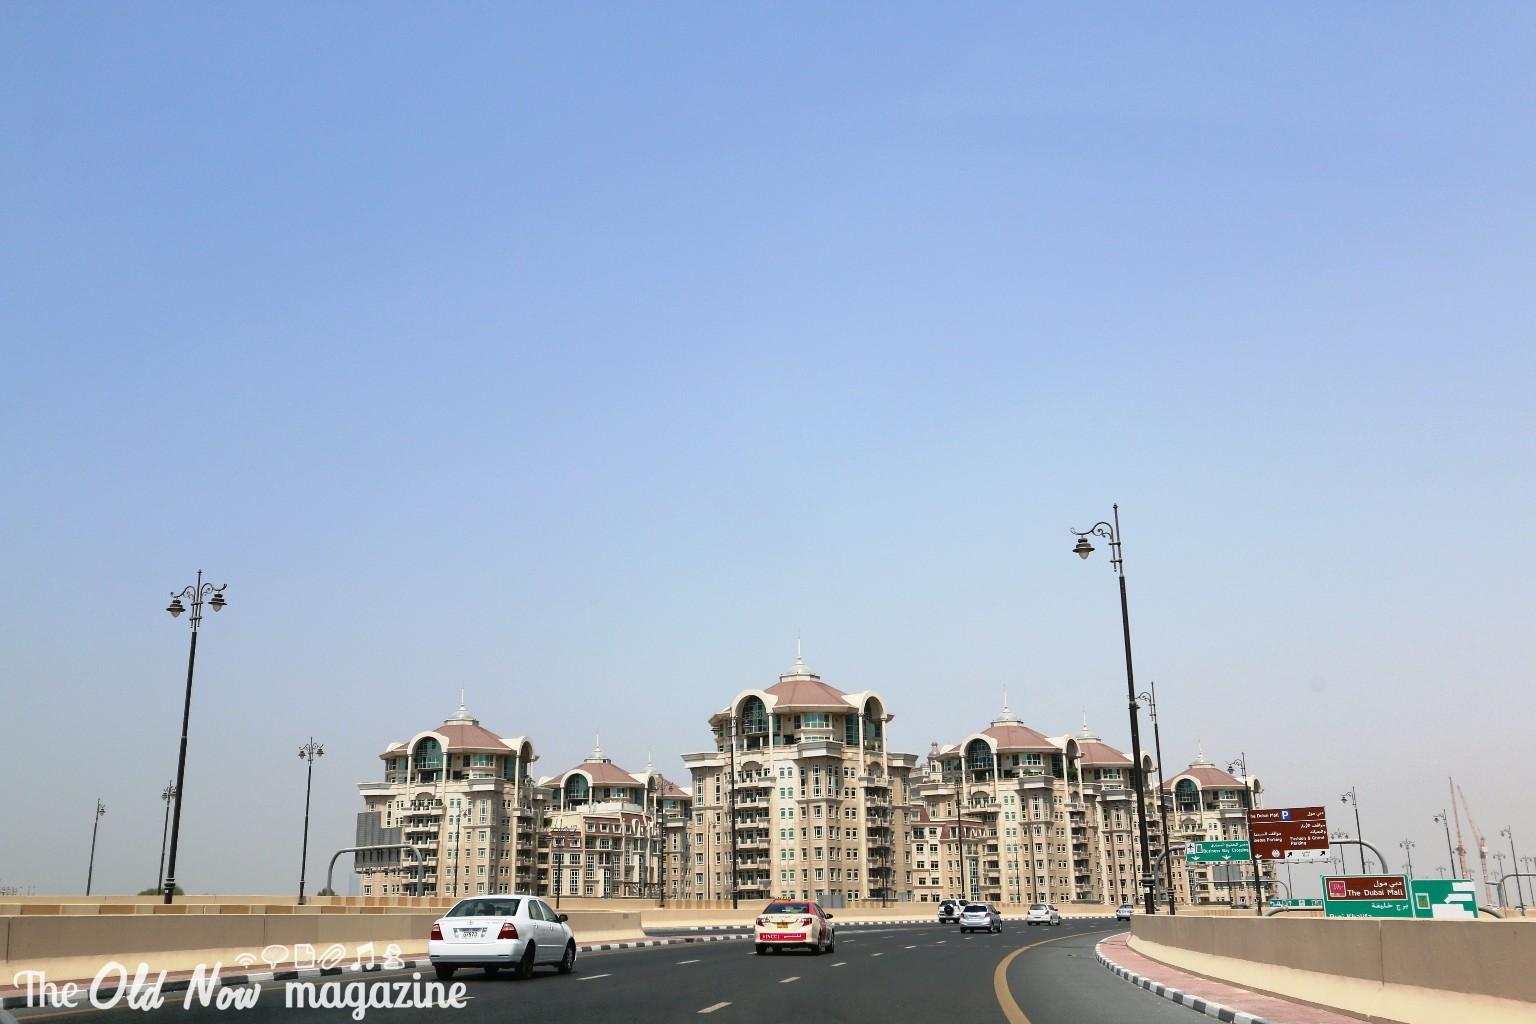 DUBAY DAY1 THEOLDNOW (31)